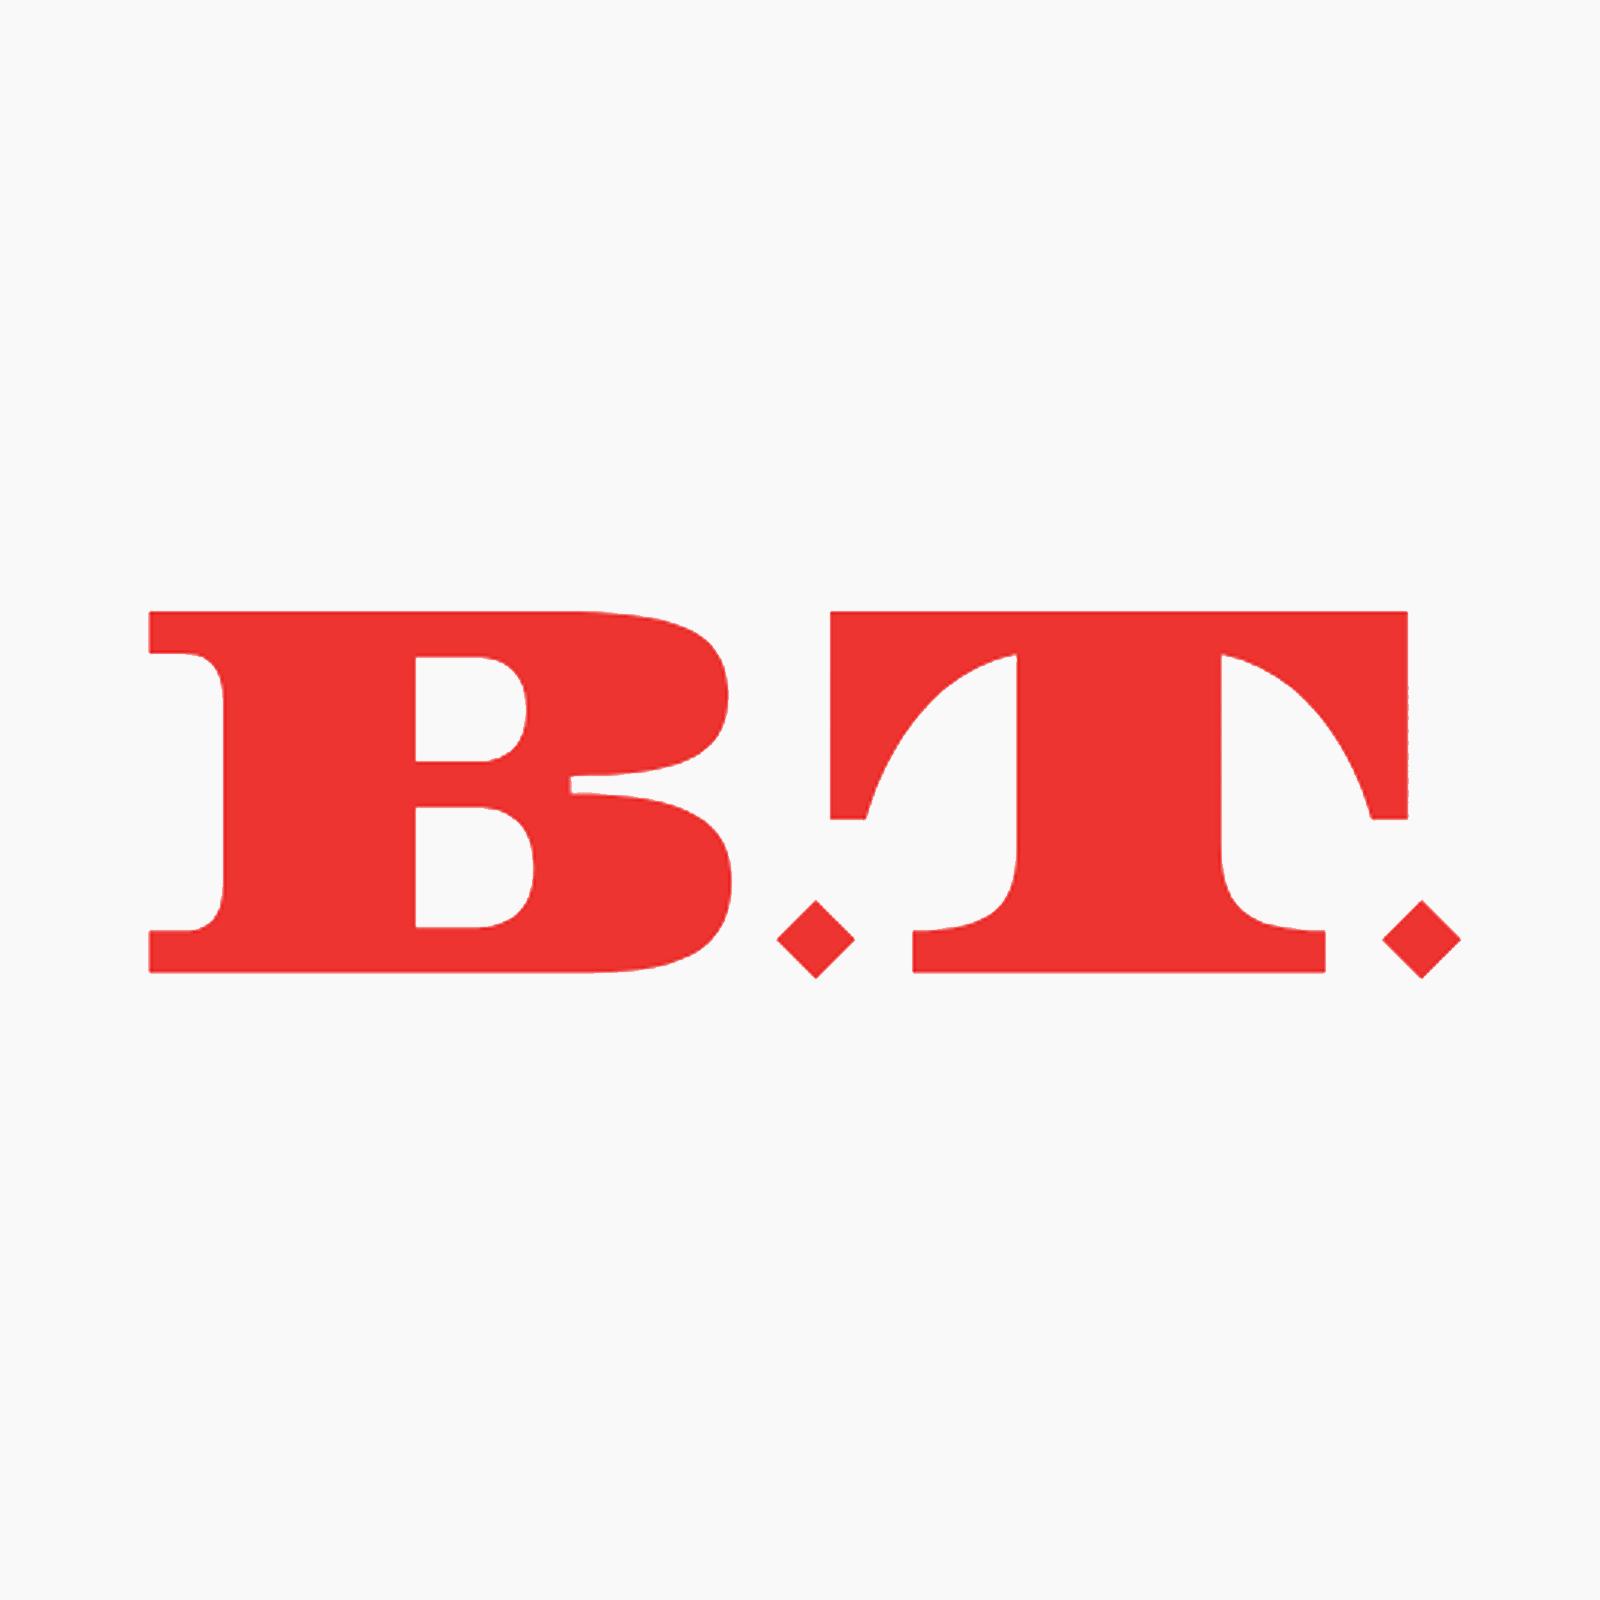 BT_02.jpg